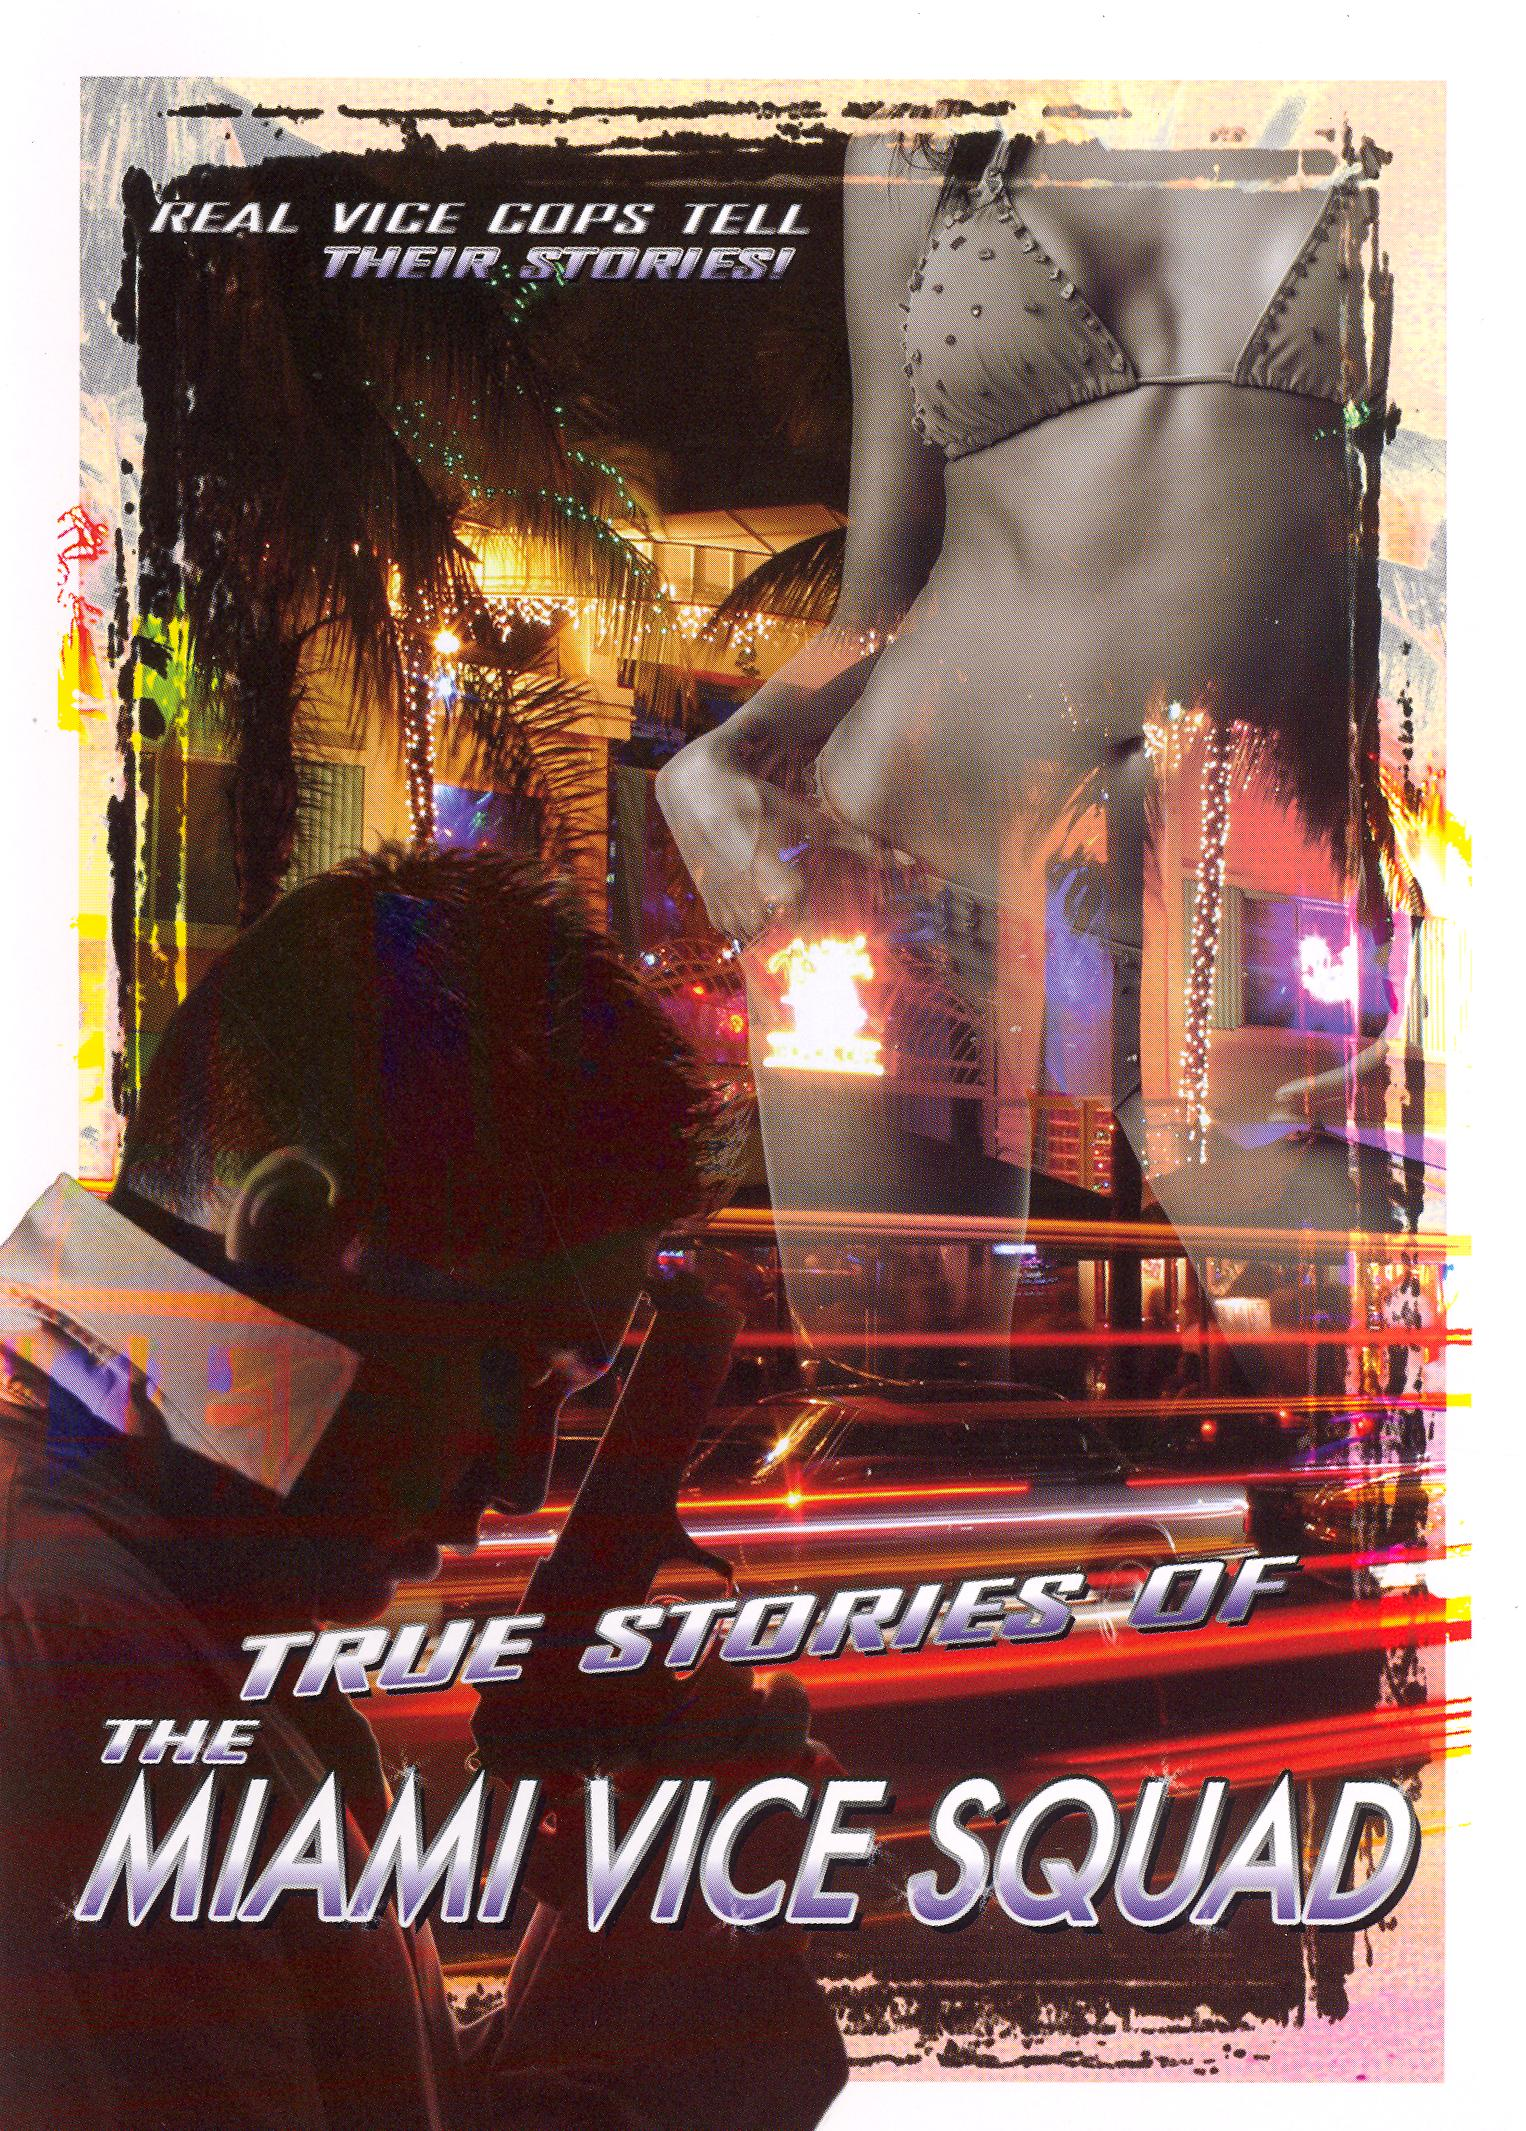 True Stories of the Miami Vice Squad